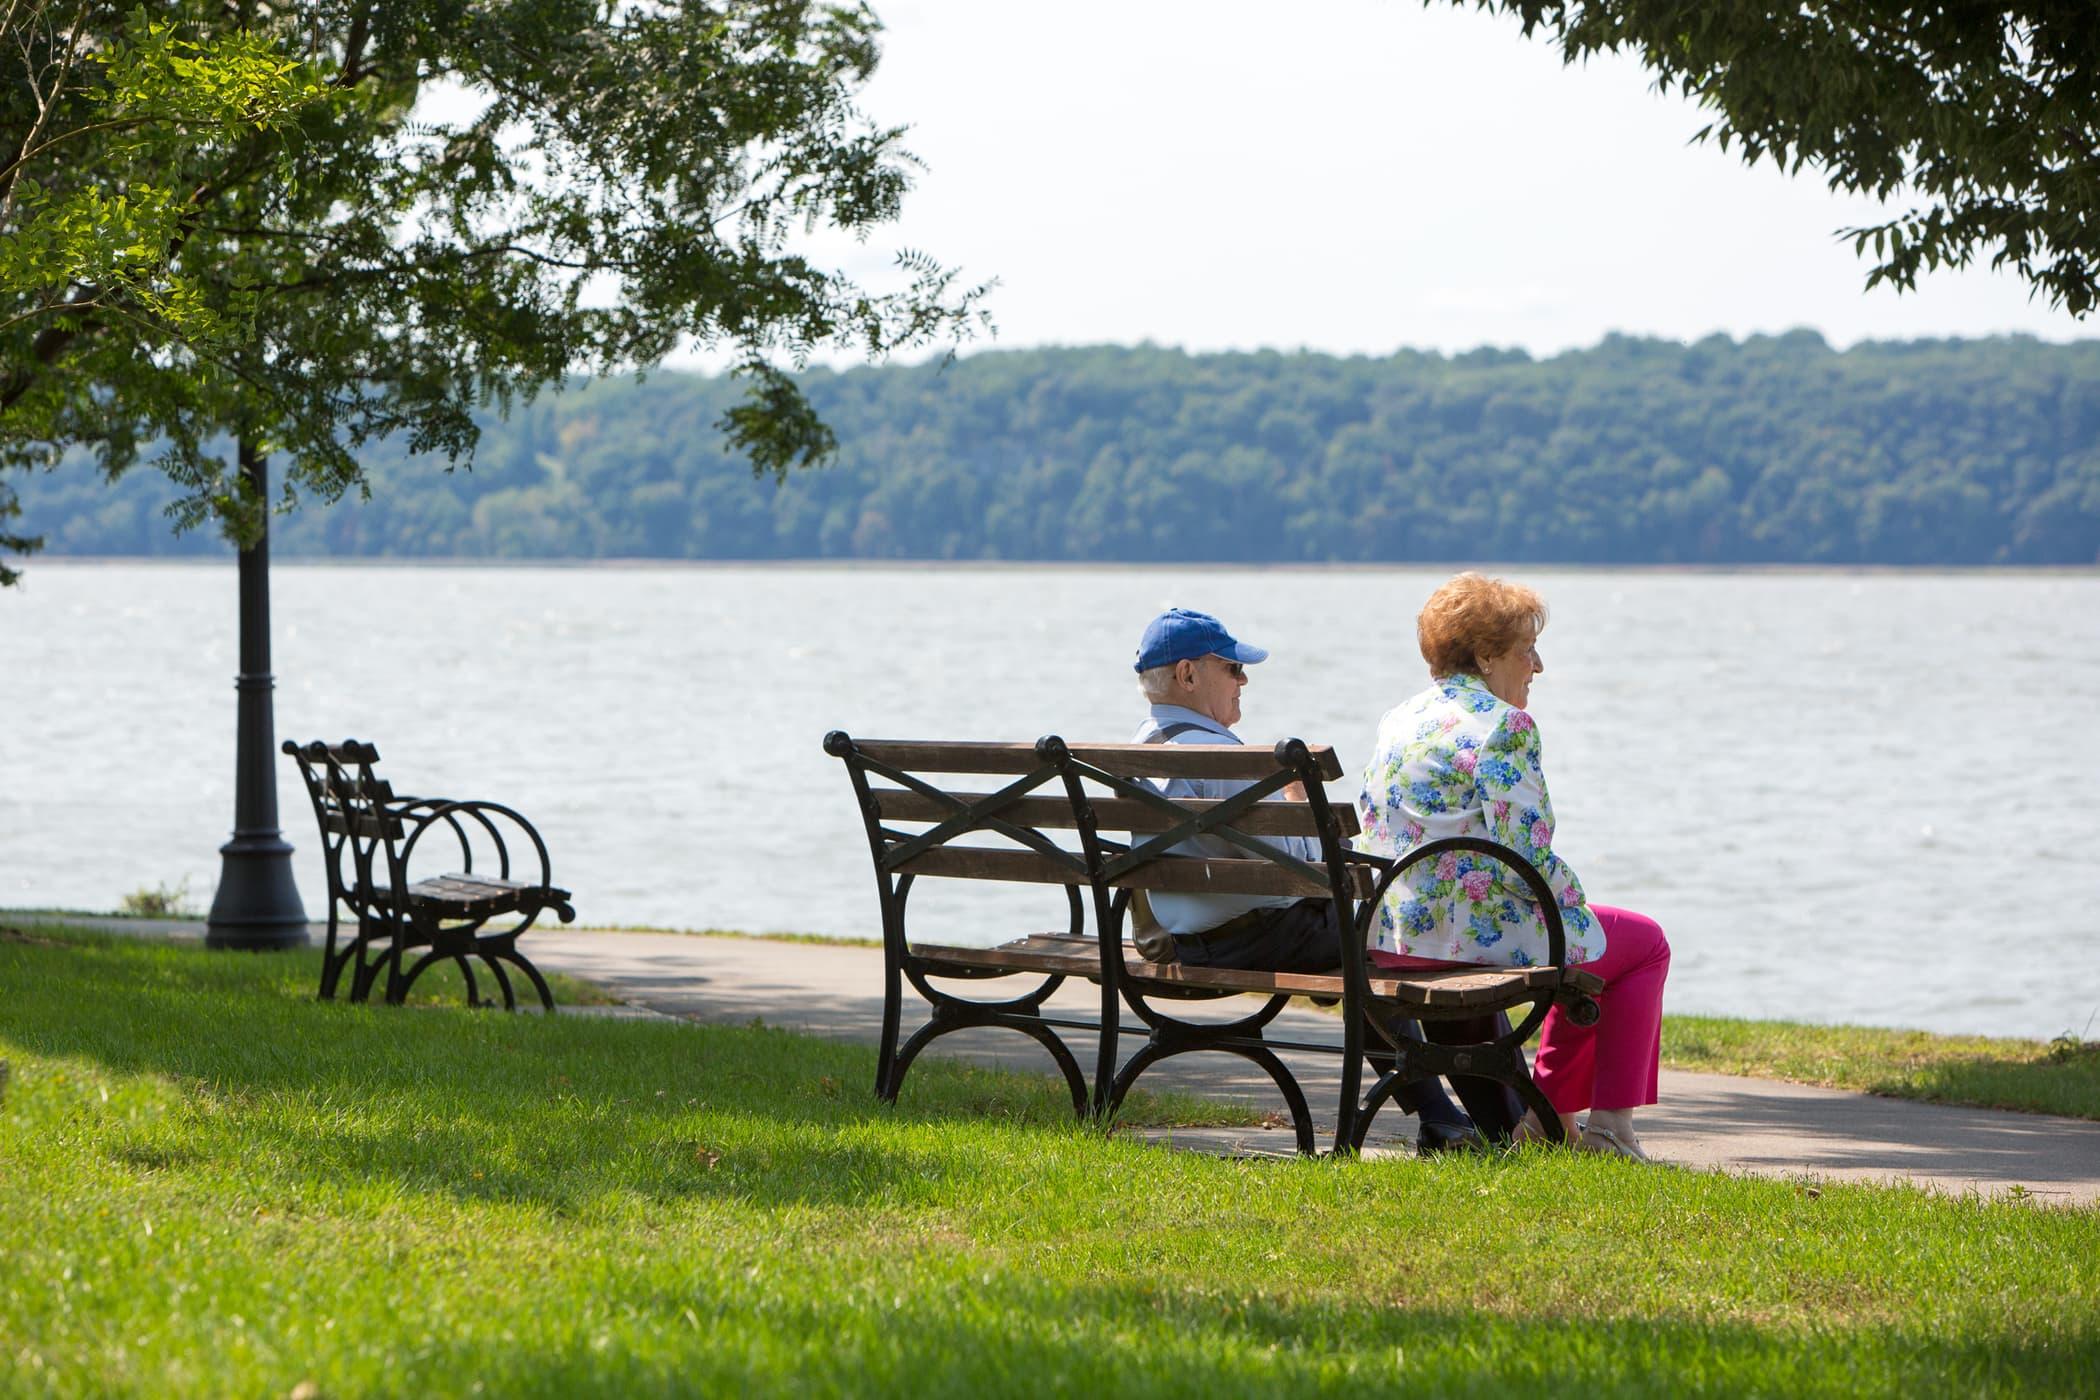 Scenic Hudson Park at Irvington